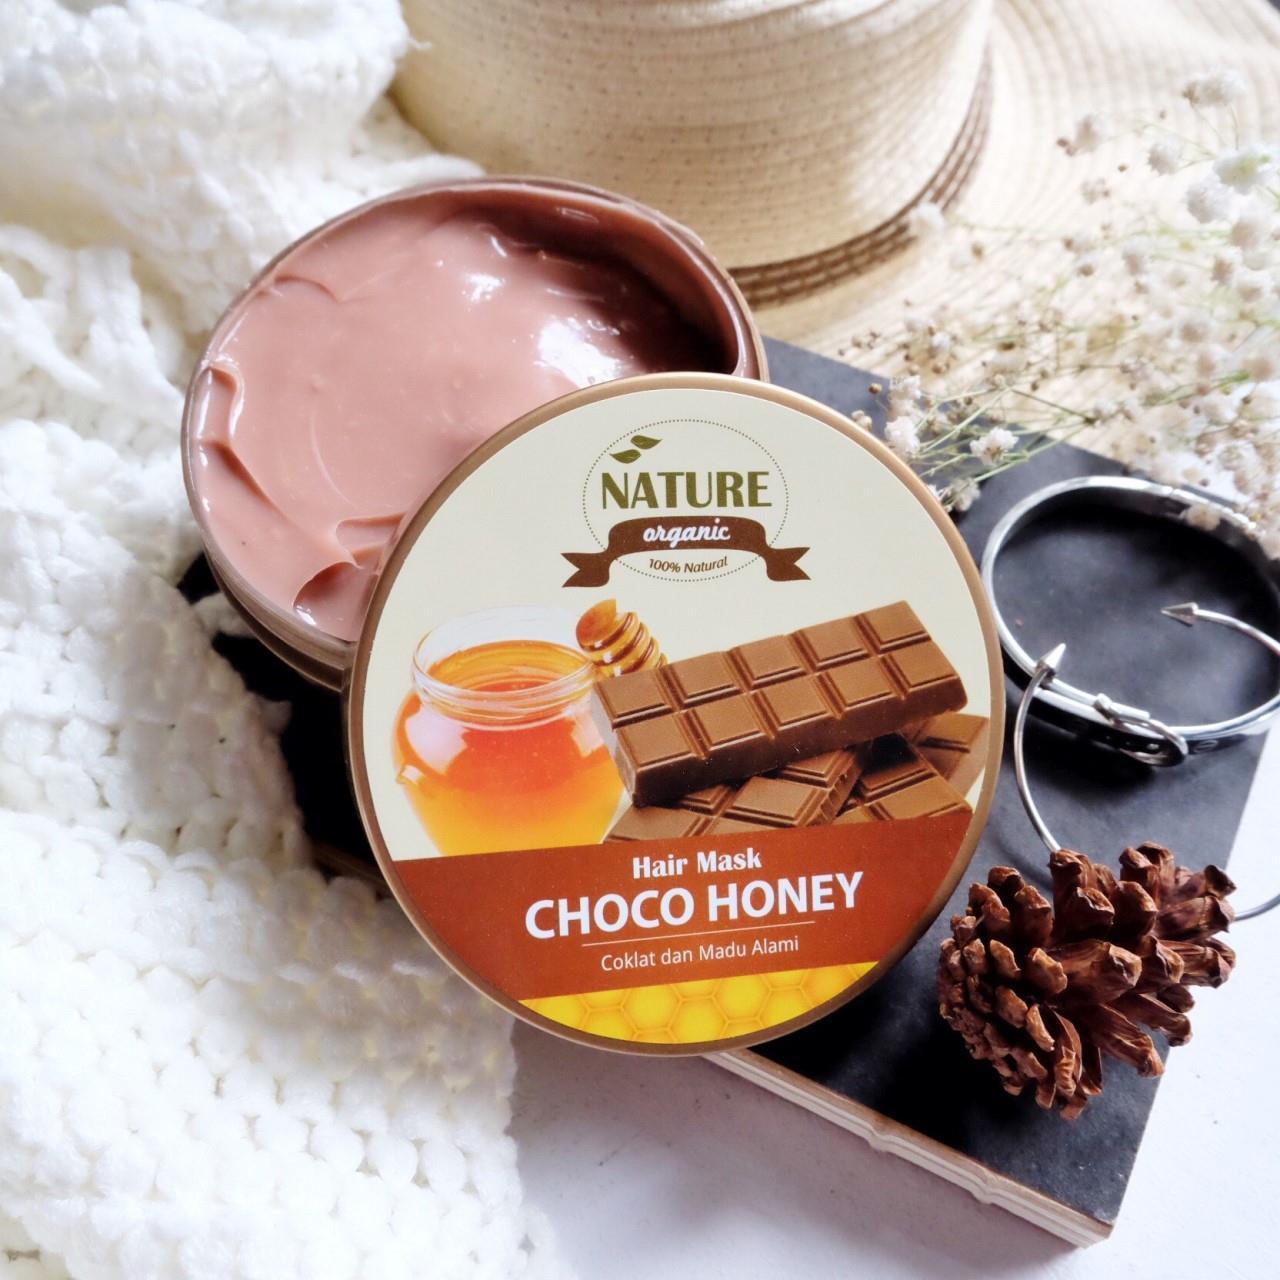 Sell Choco Honey Hair Mask From Indonesia By Lulur Nature Organic Wajah Bengkoang Milk Medancheap Price